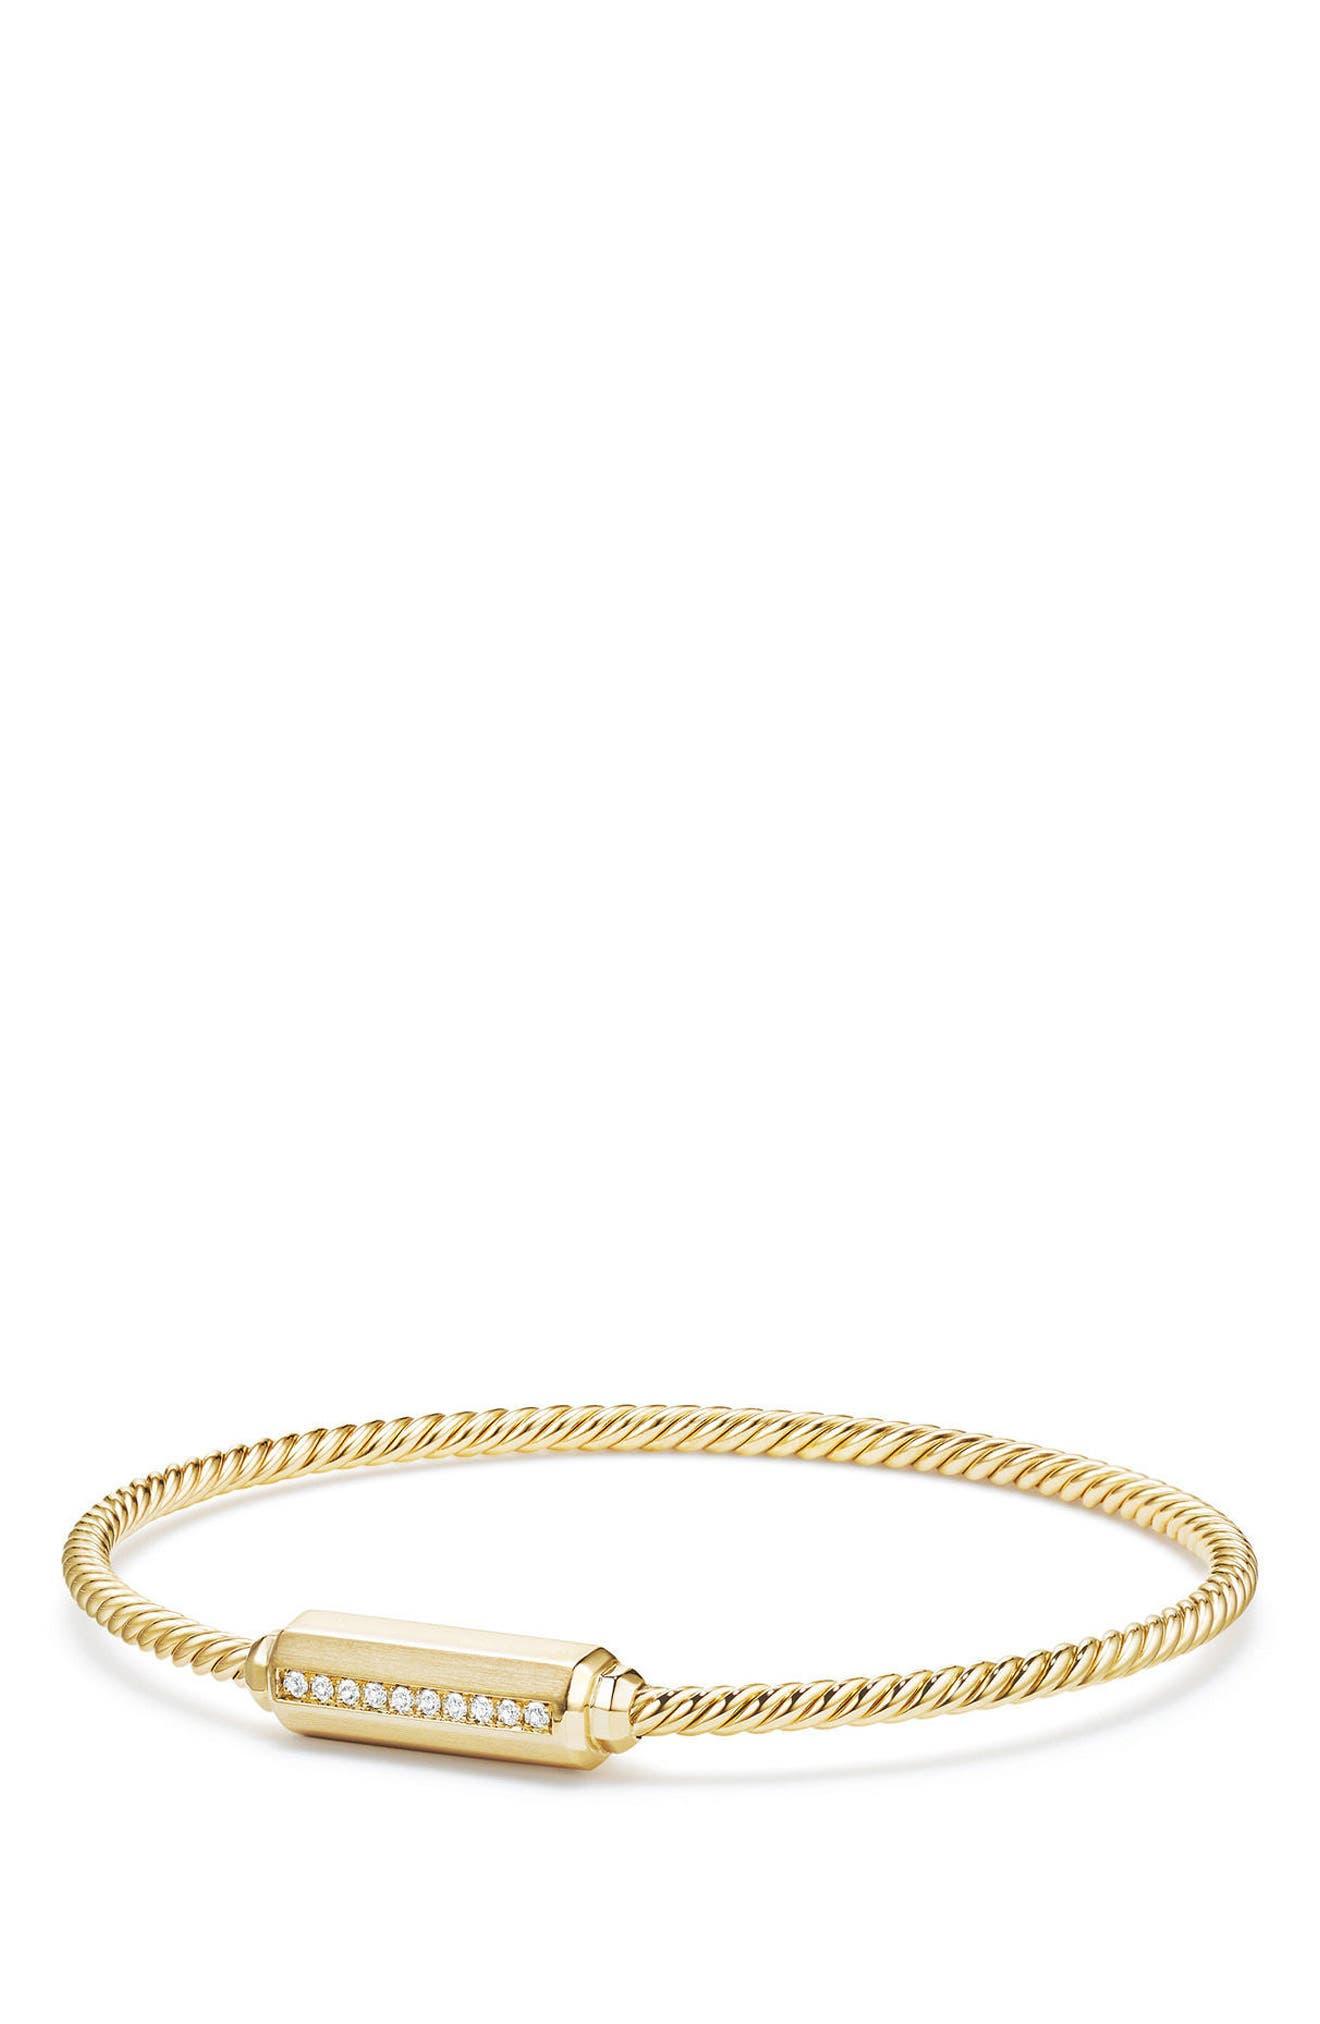 Main Image - David Yurman Barrels Bracelet with Diamonds in 18K Gold